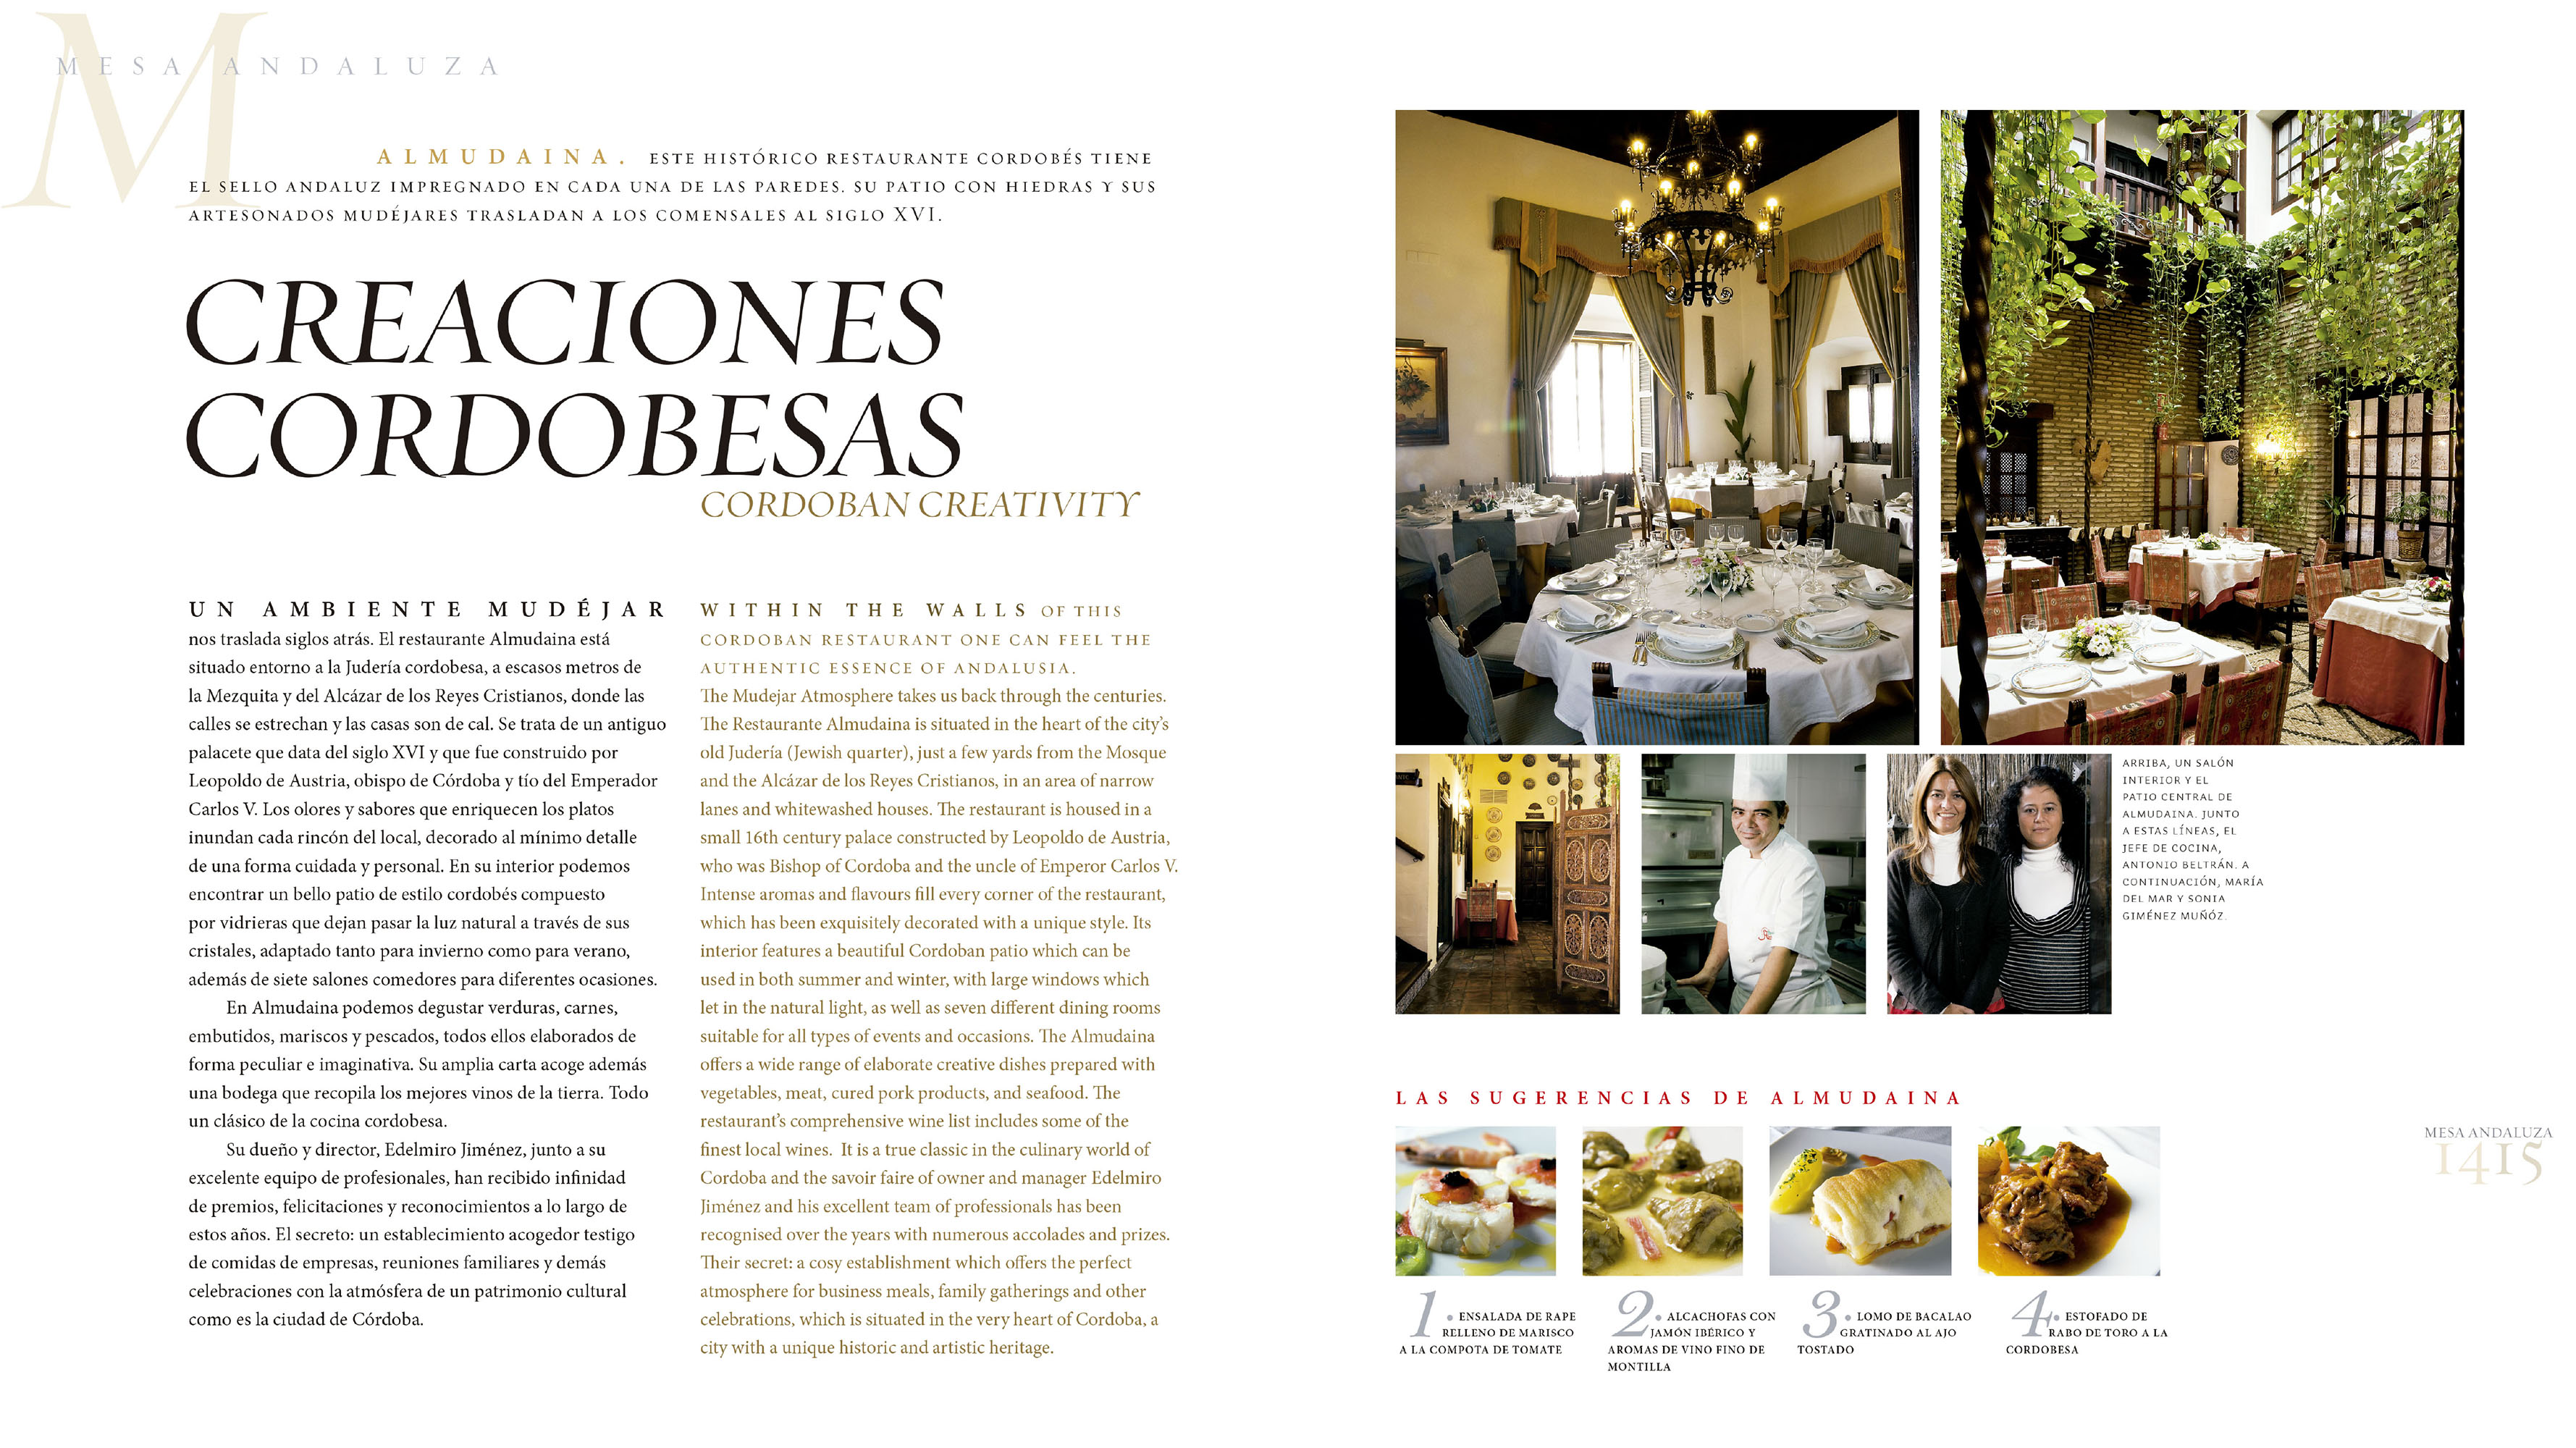 Creaciones cordobesas - Restaurante Almudaina | Revista ORO | dic 2009